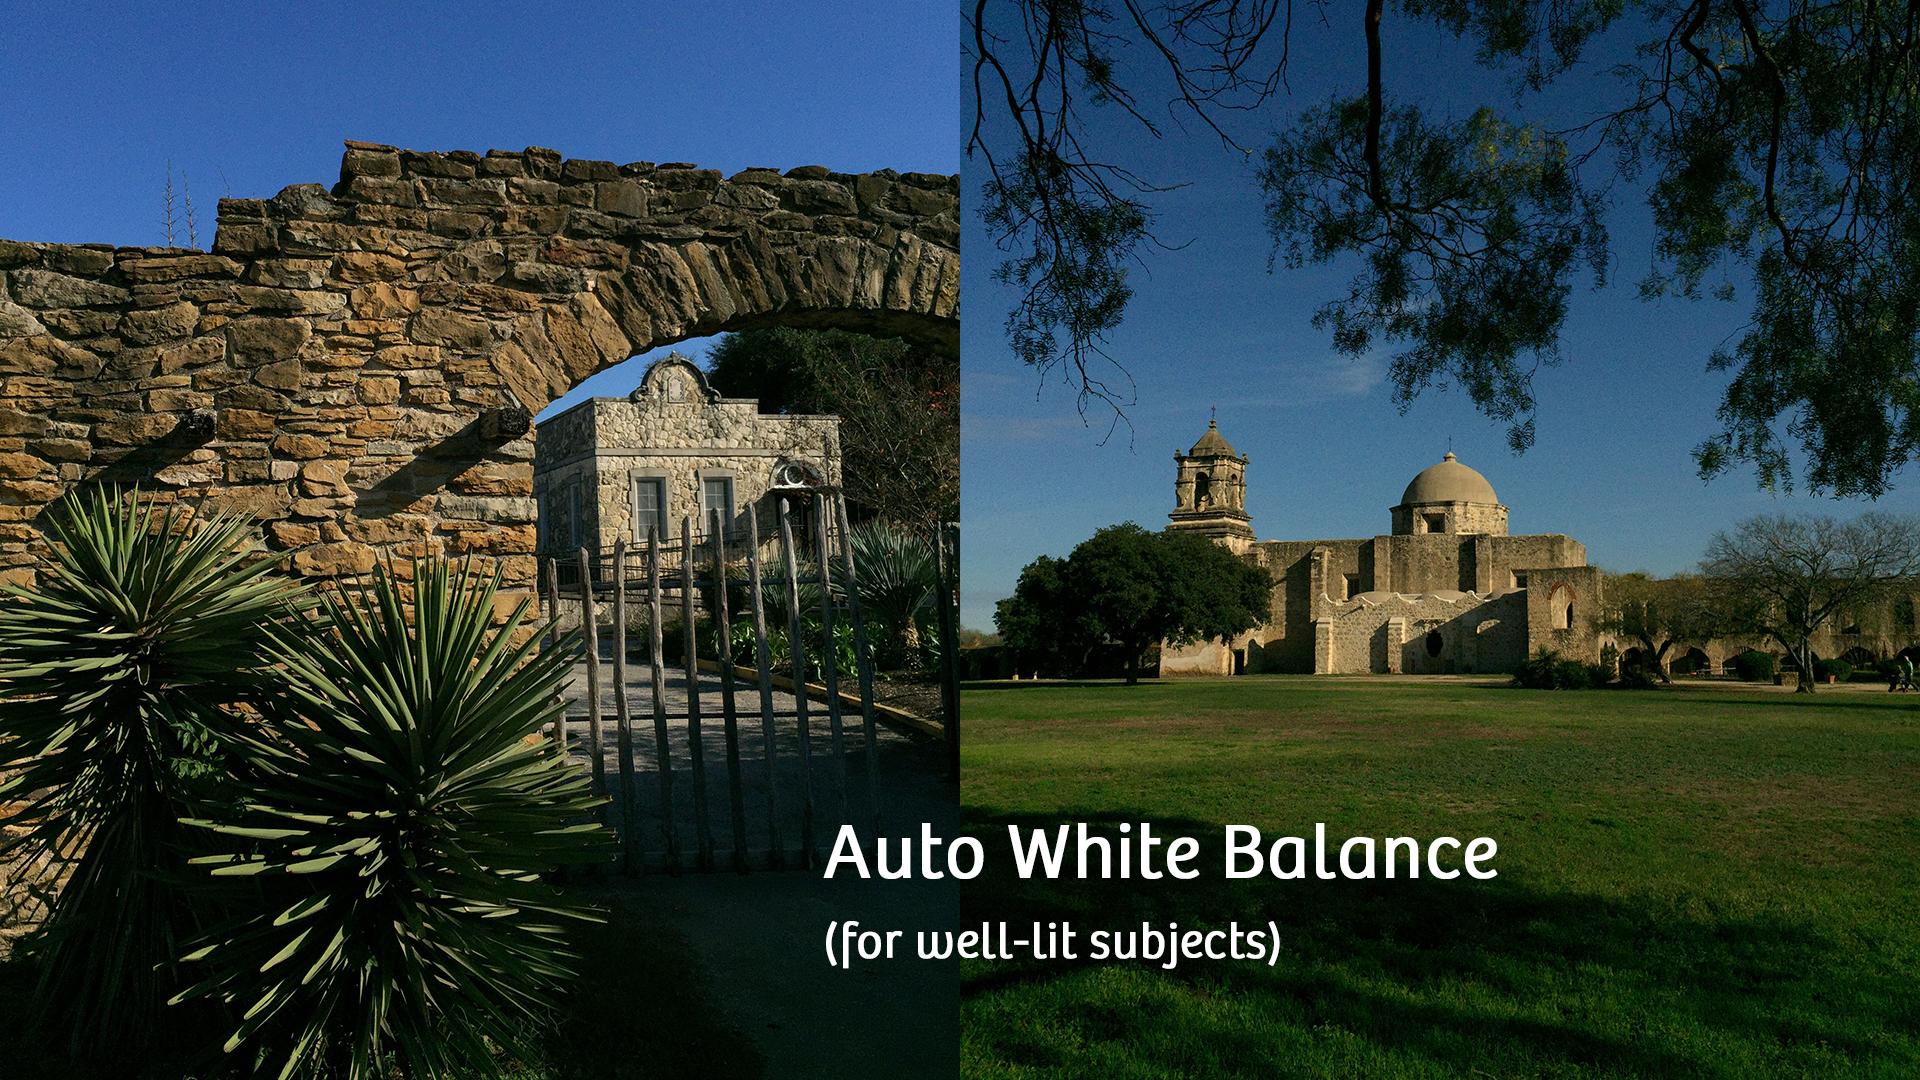 Auto White Balance